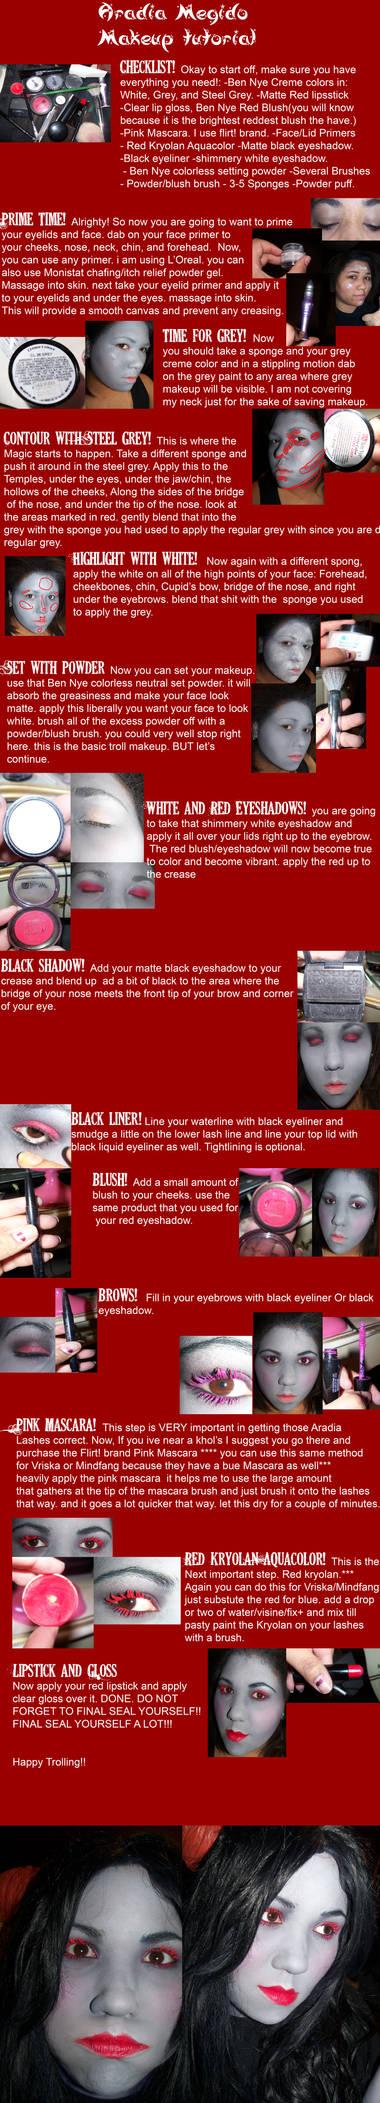 Aradia Megido Makeup Tutorial by MaliceMidnight